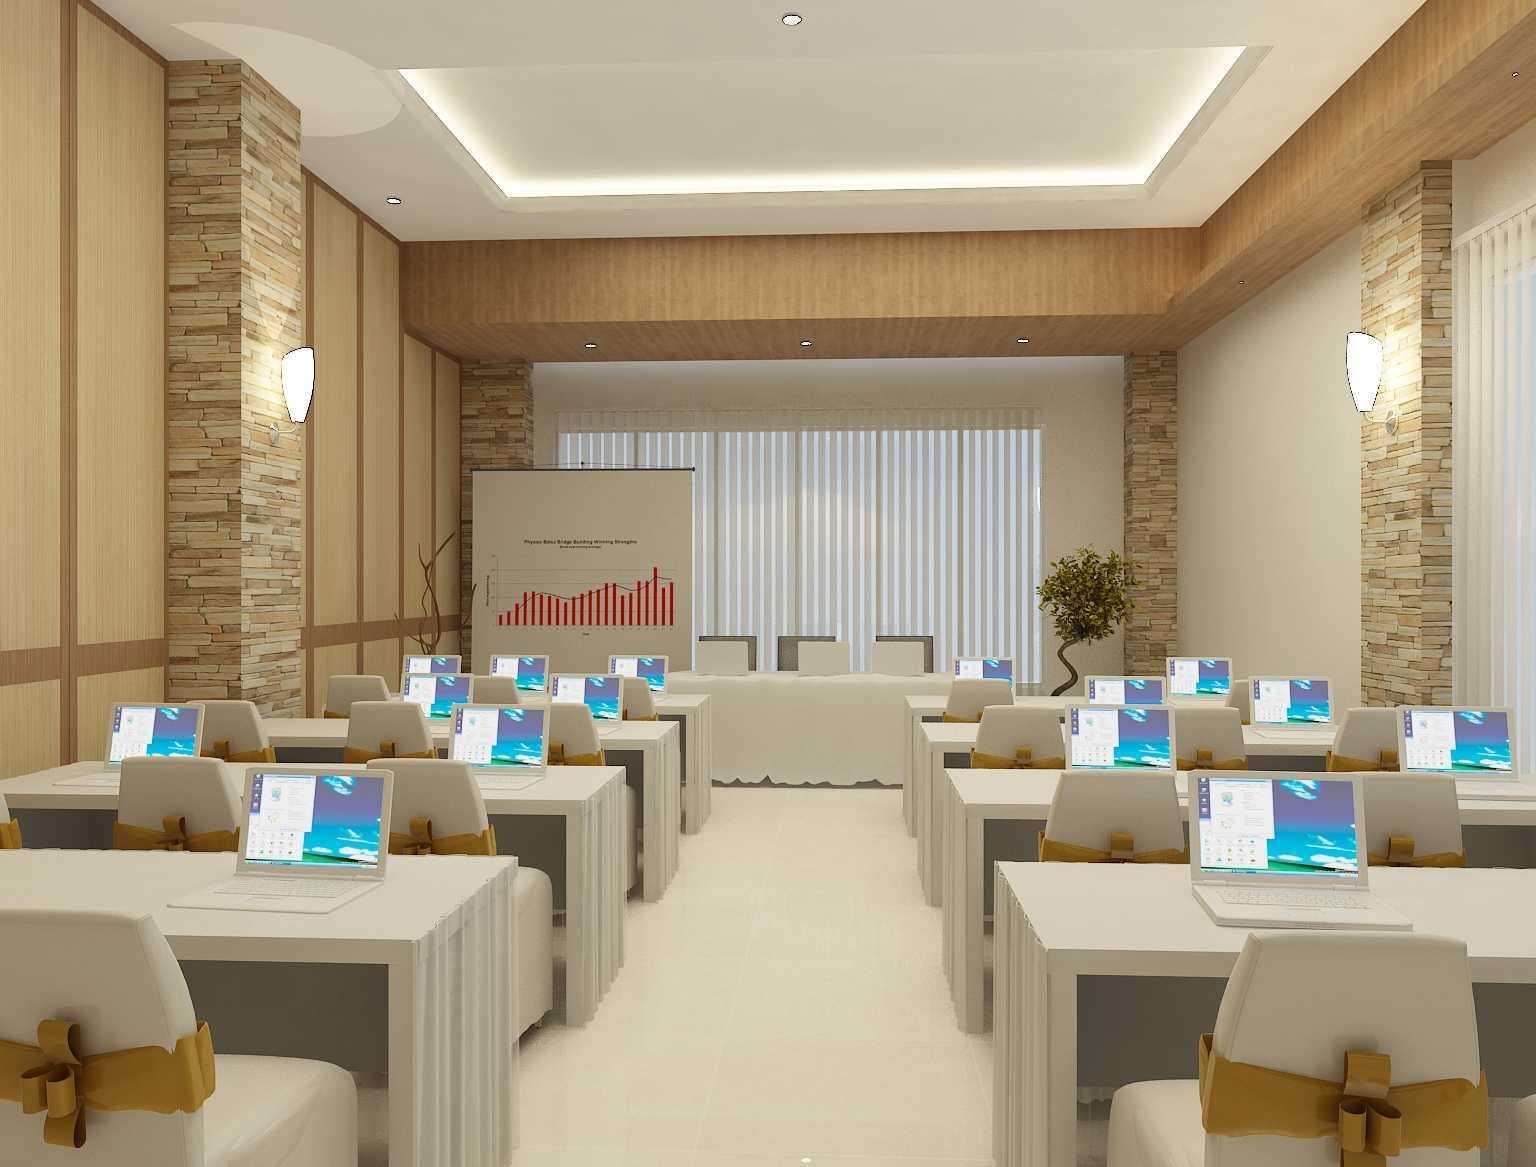 Conarch Bangun Sejahtera Dwangsa Hap Hotel Solo Kota Surakarta, Jawa Tengah, Indonesia Kota Surakarta, Jawa Tengah, Indonesia Conarch-Bangun-Sejahtera-Dwangsa-Hap-Hotel-Solo   59932